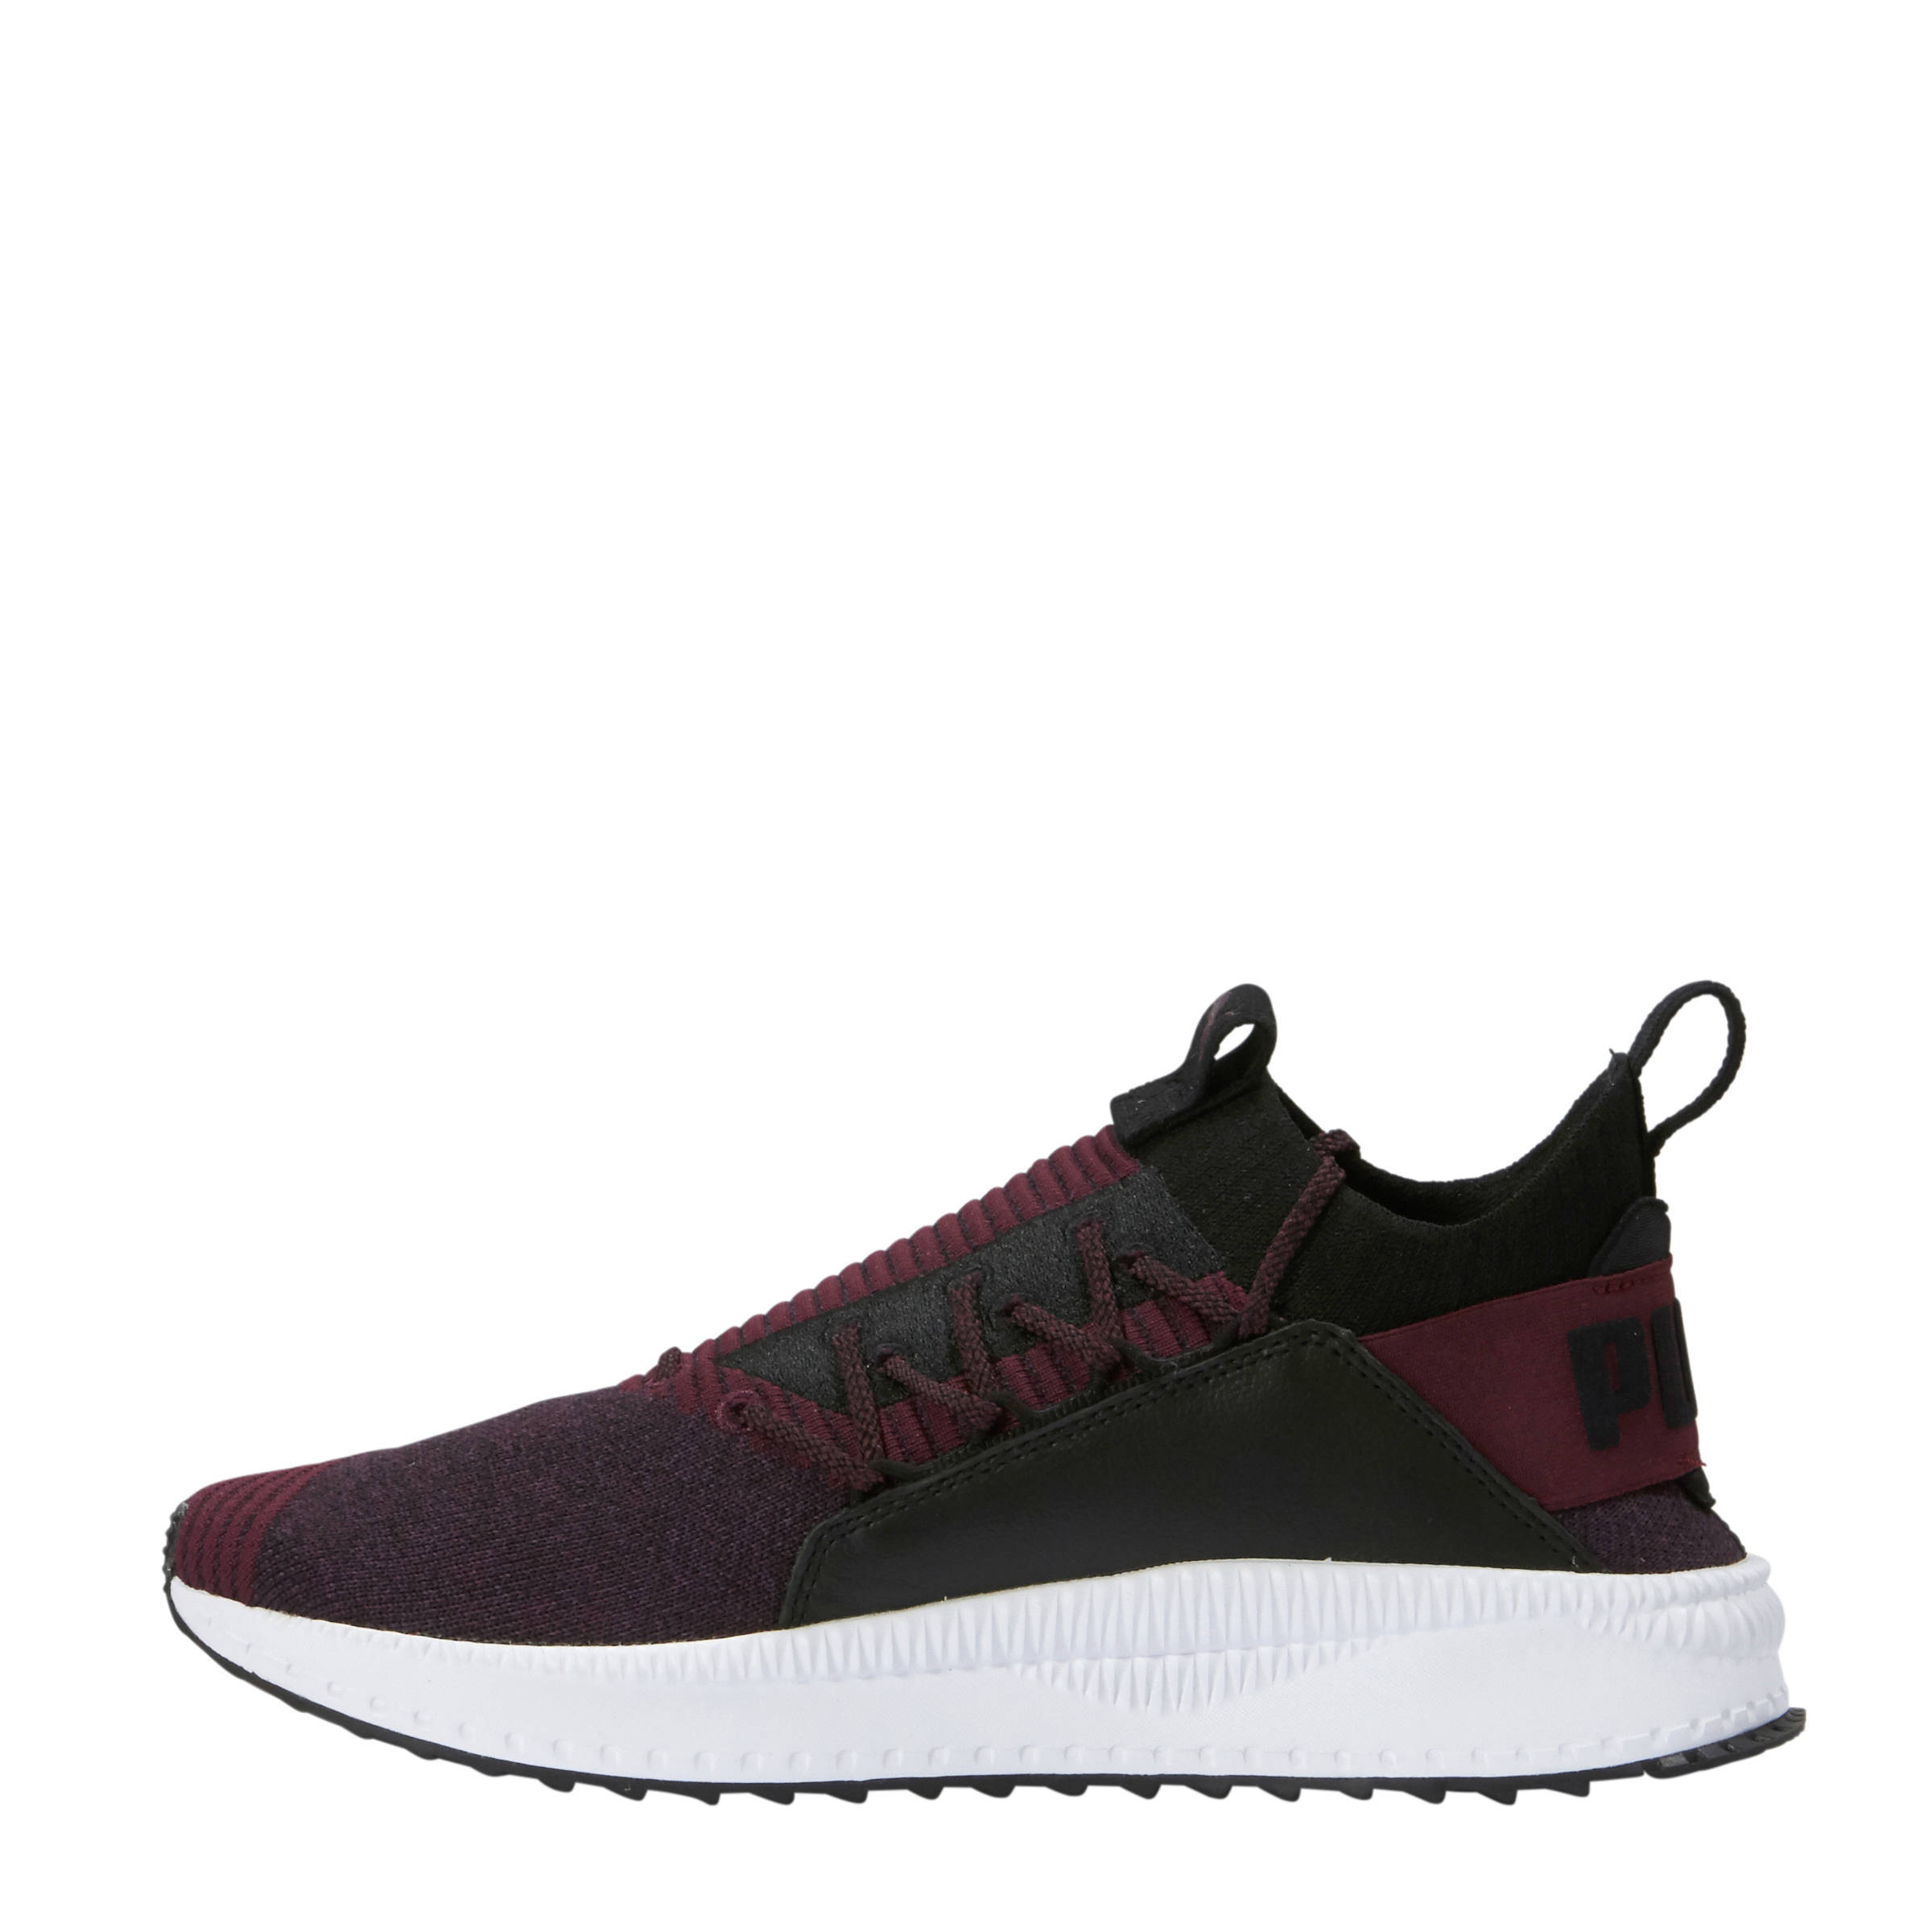 ee57aa4869de96 Puma Evolution TSUGI Jun Sport Stripes sneakers bordeauxrood